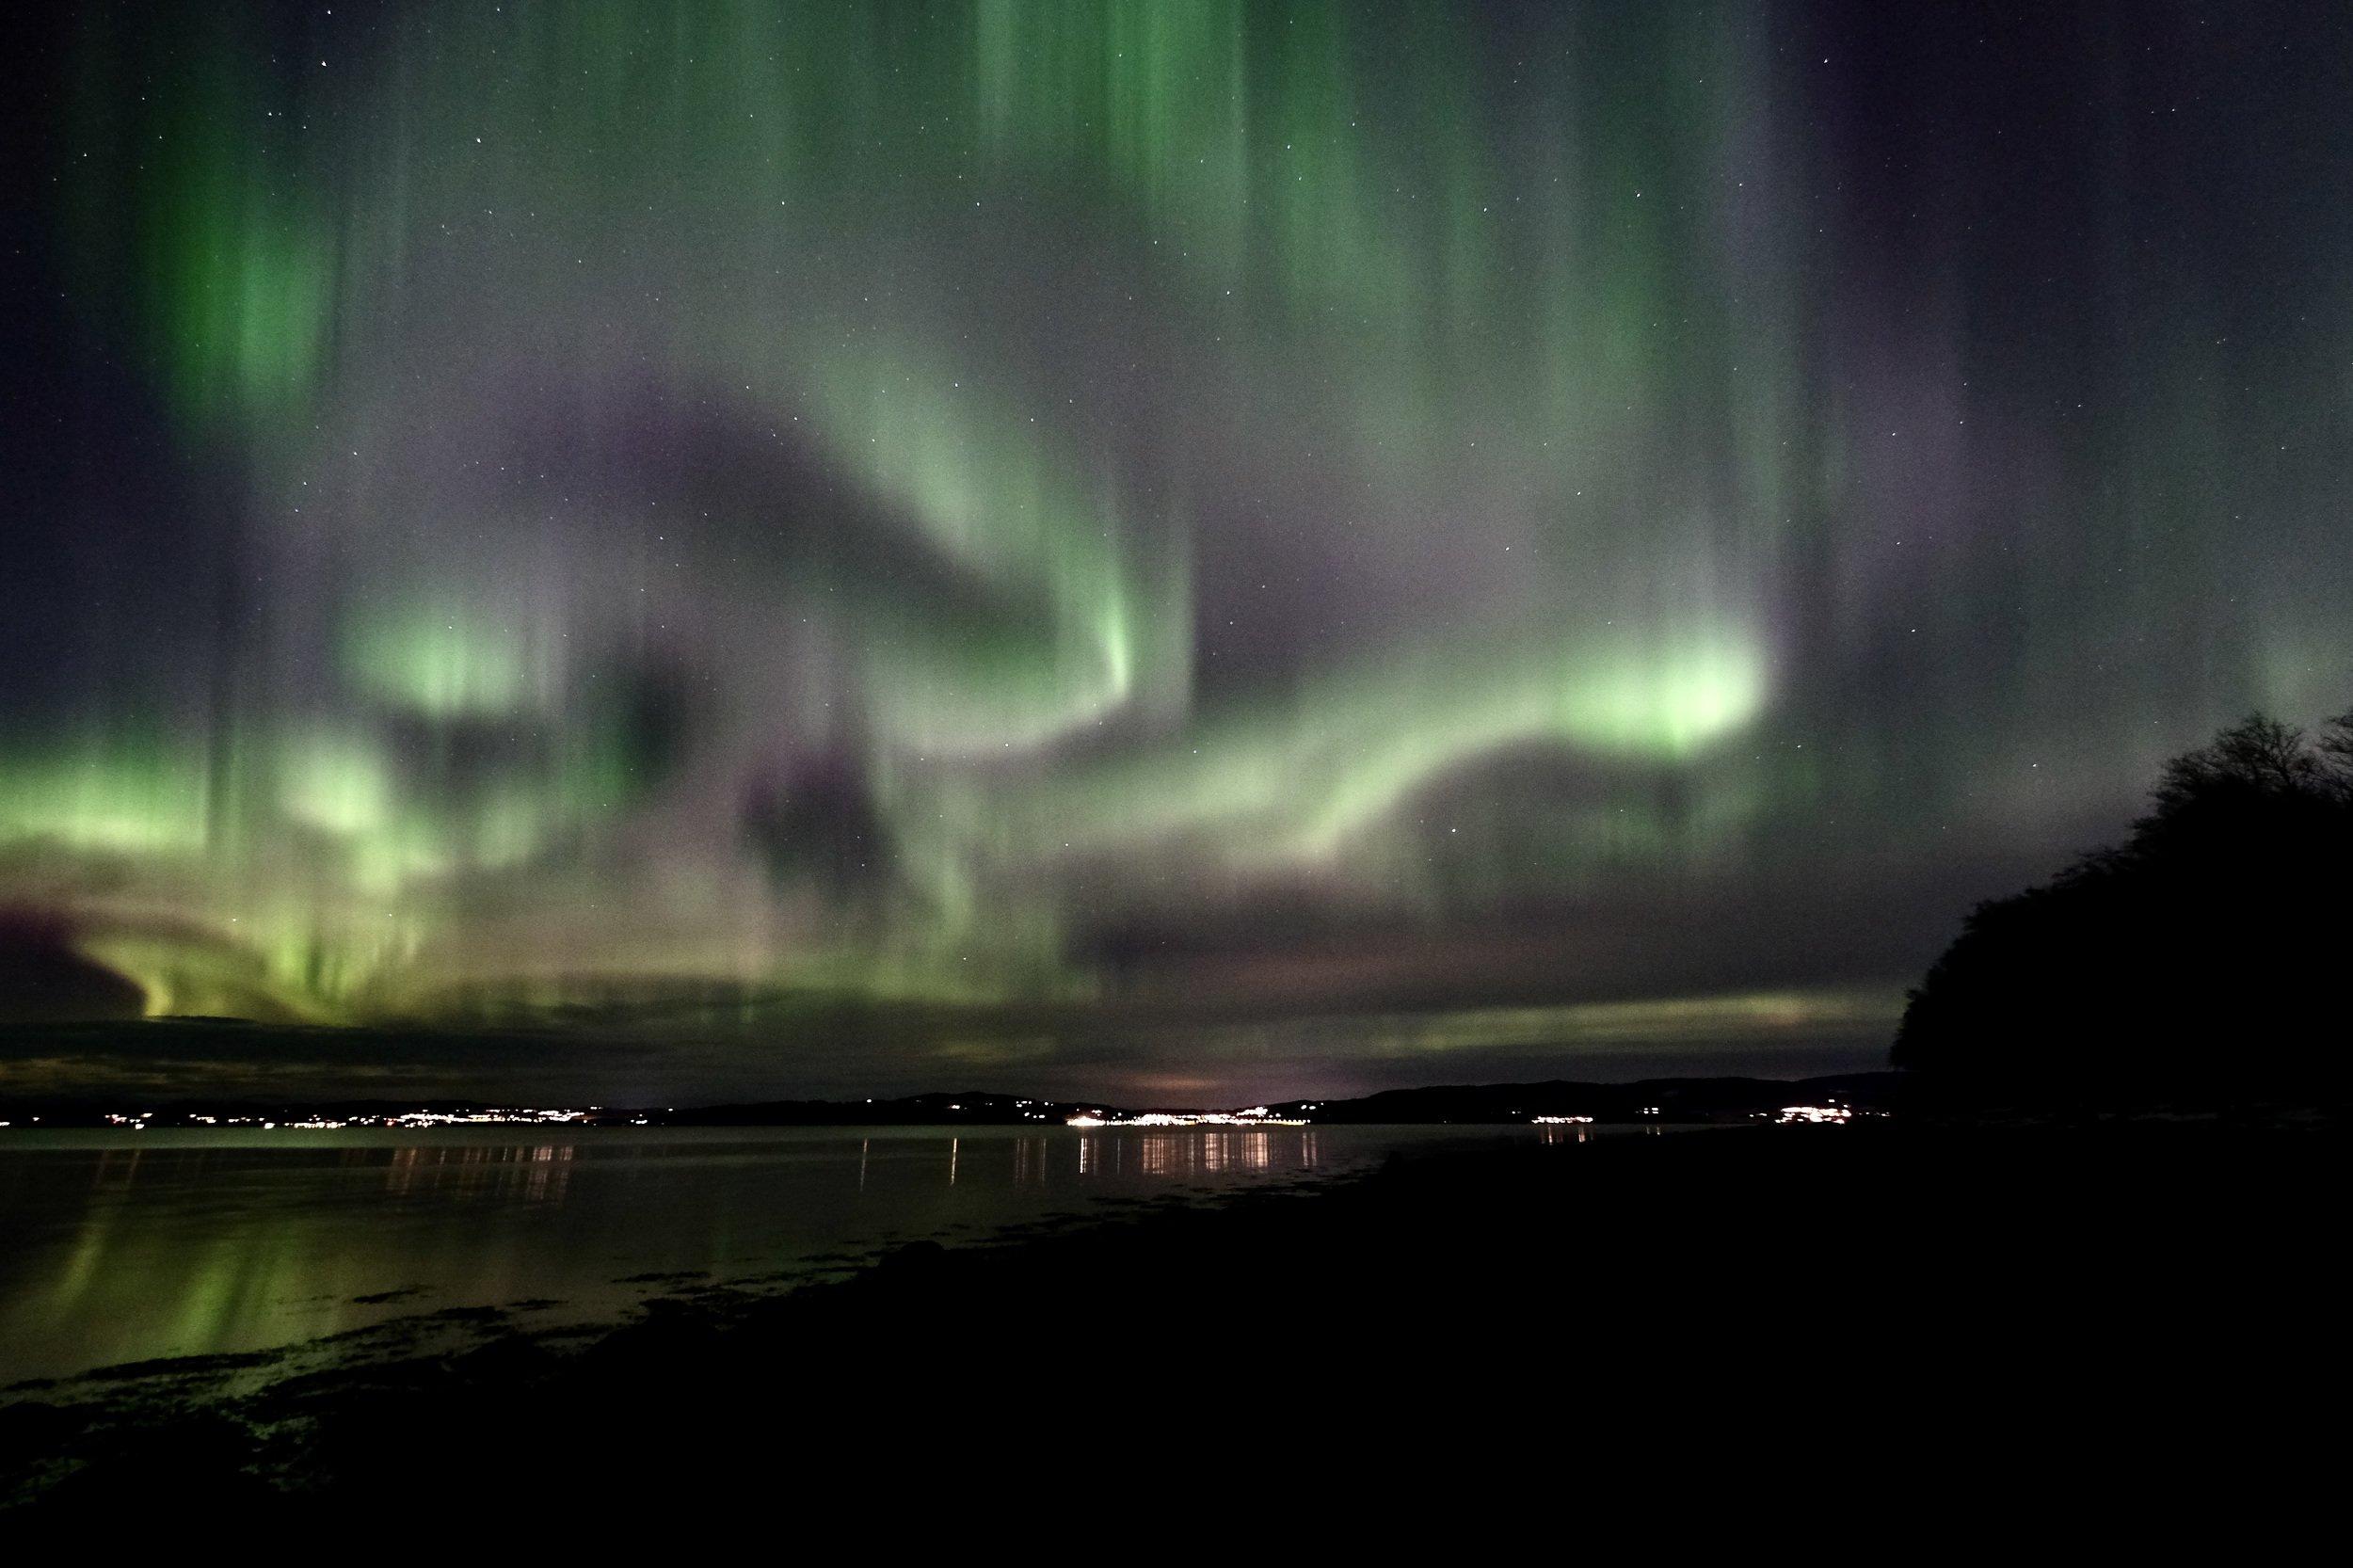 Night, Northern Lights, Aurora Borealis, nature, Norway, fjord, Trondheimsfjorden, landscape, water, colors, reflection, stars, , Povarova Ree Svetlana